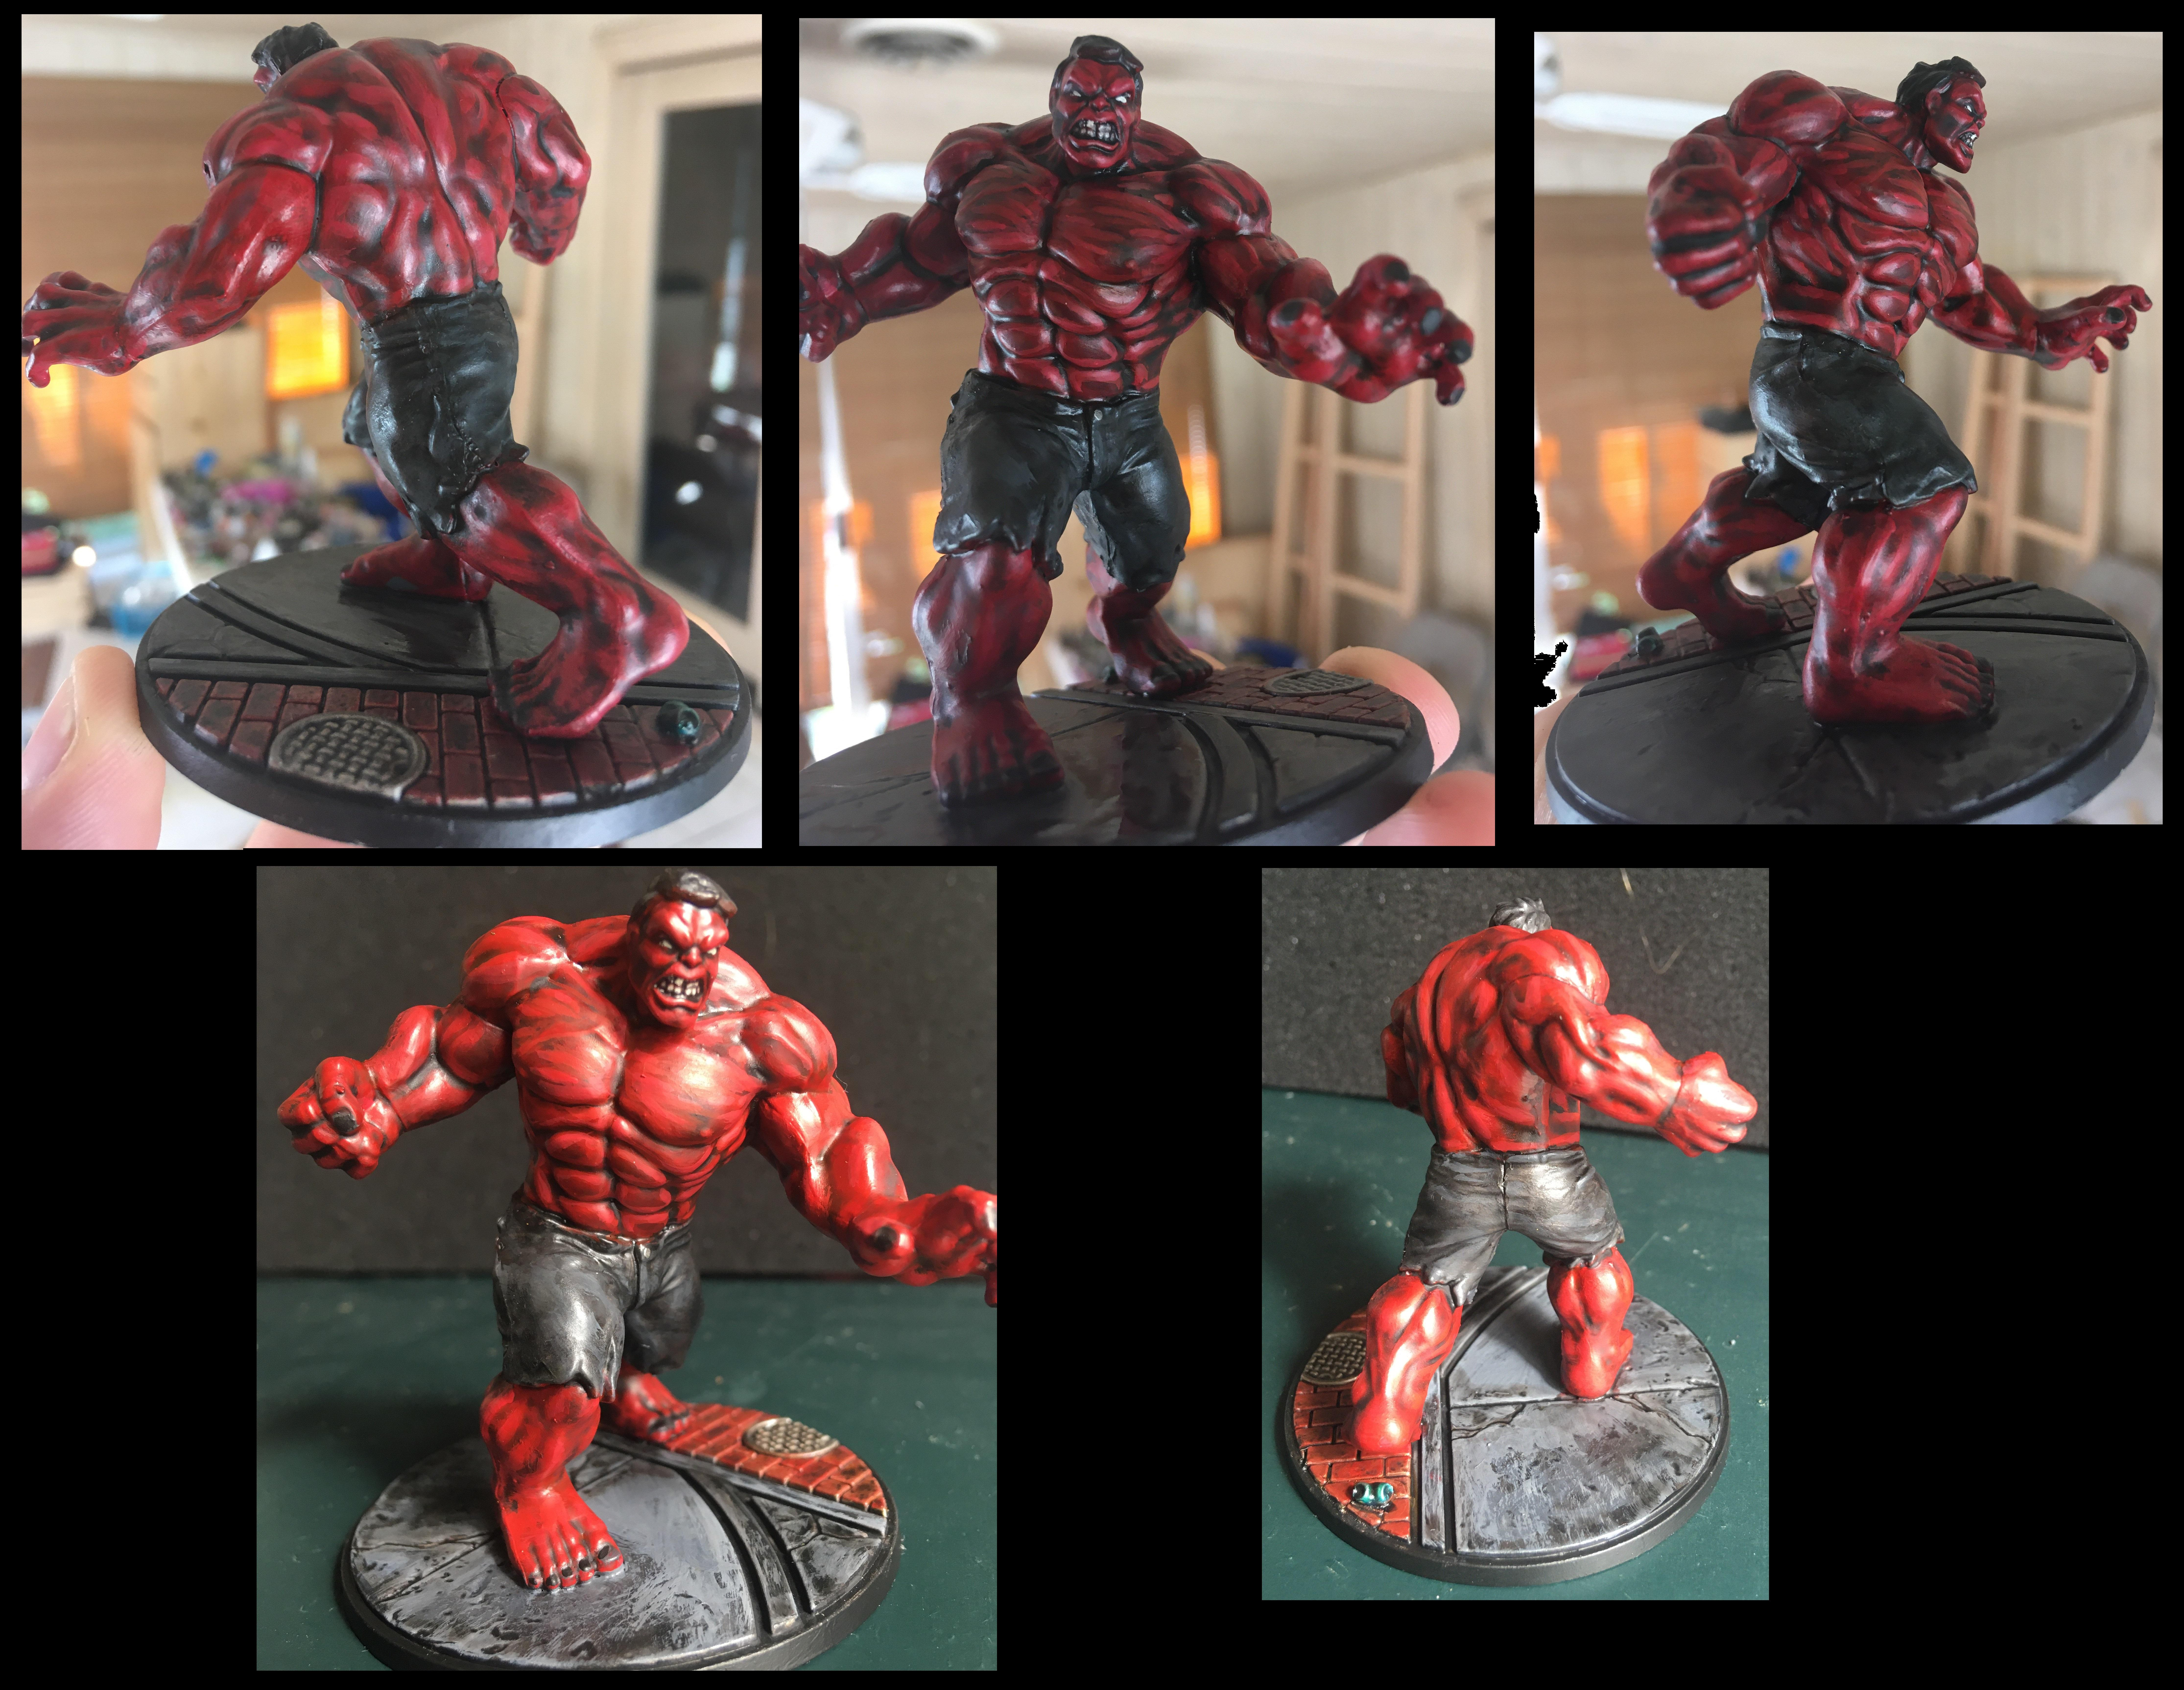 Comic, Crisis Battlesuit, General Ross, Hulk, Marvel, Protocol, Red Hulk, Thunderbolt